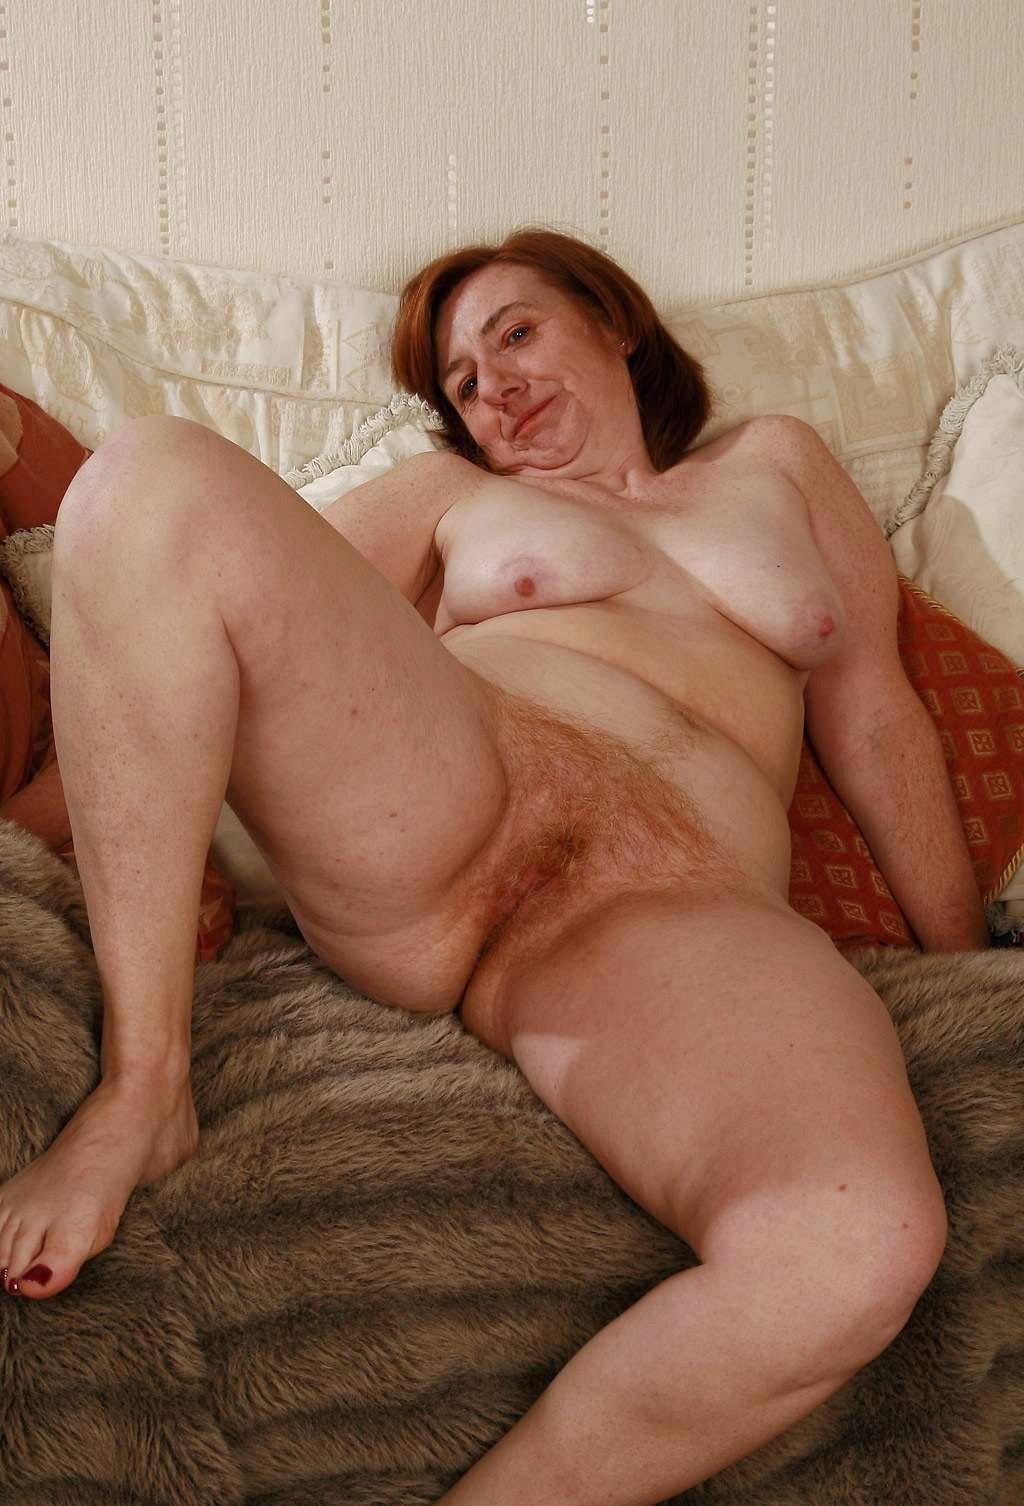 Mature Redhead Porn Lady Hairy Photo